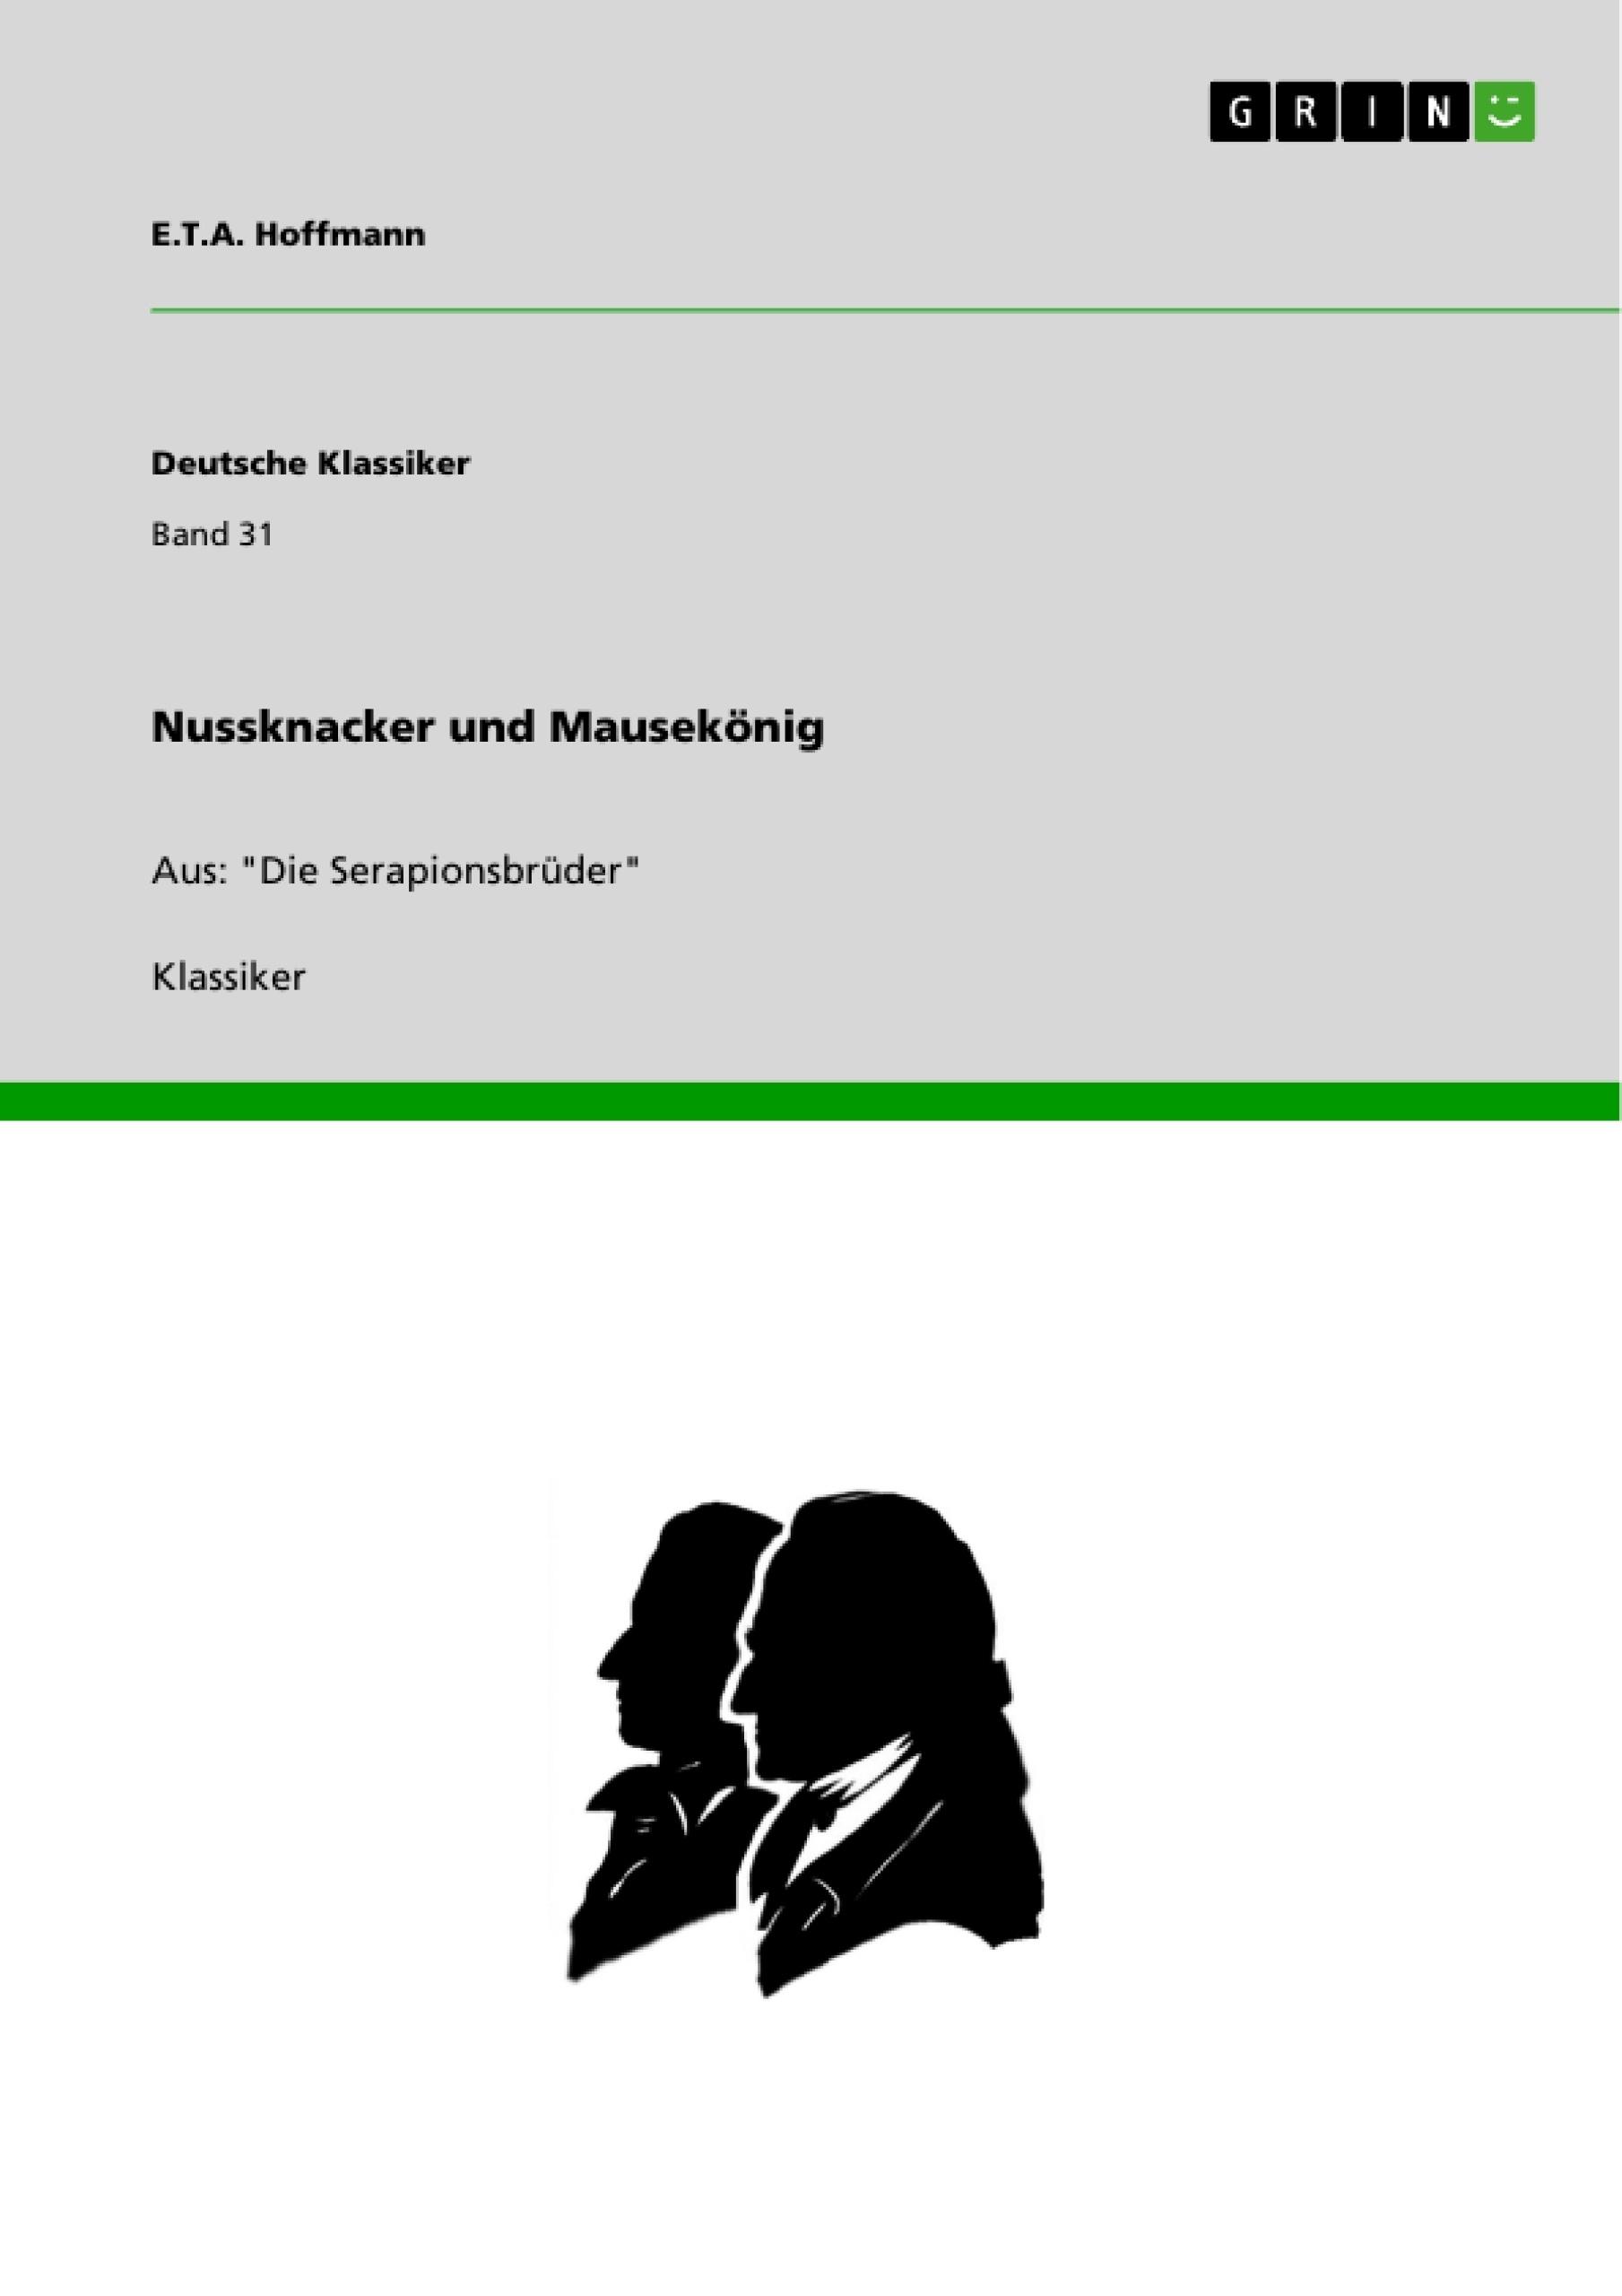 Titel: Nussknacker und Mausekönig